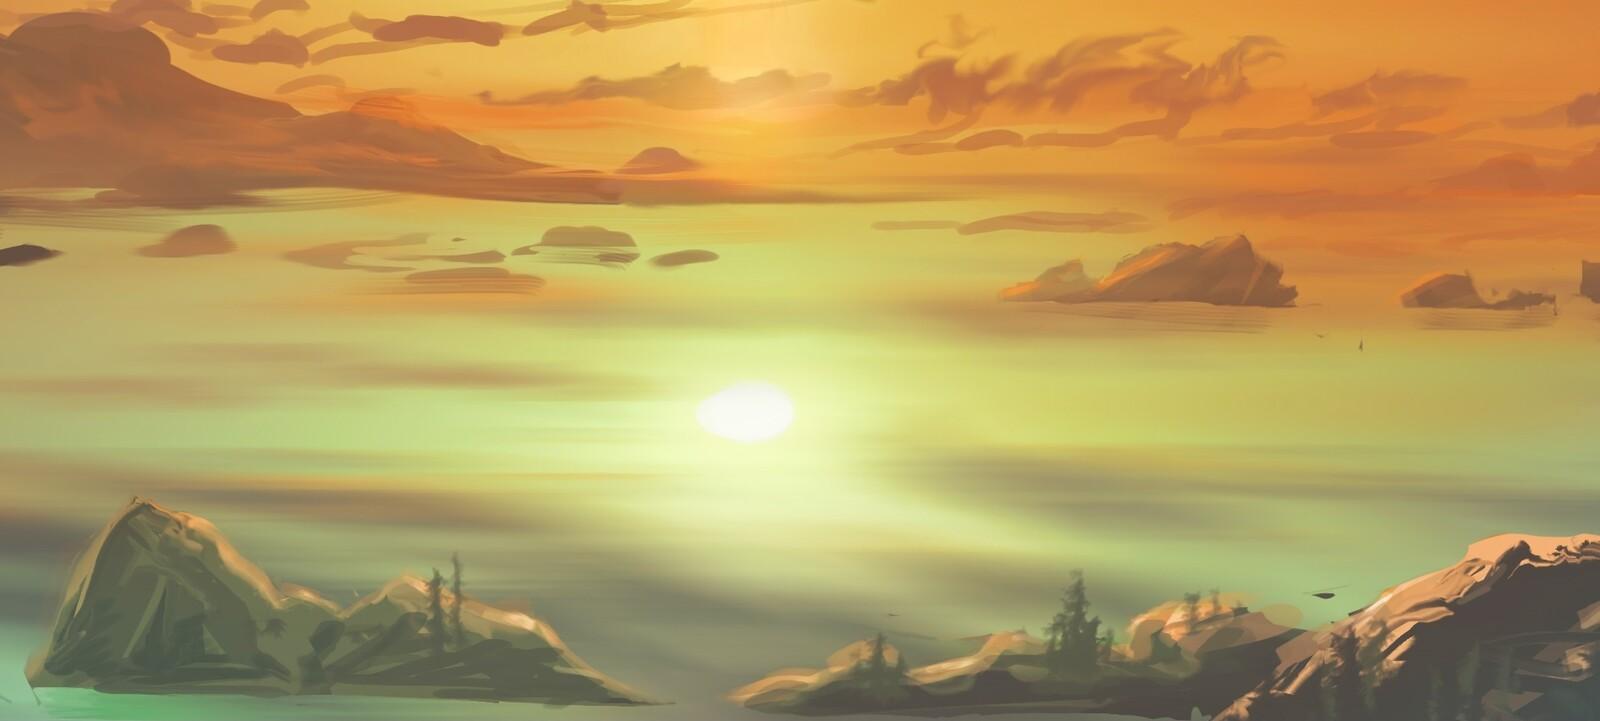 just below horizon - detail1 underwater sun